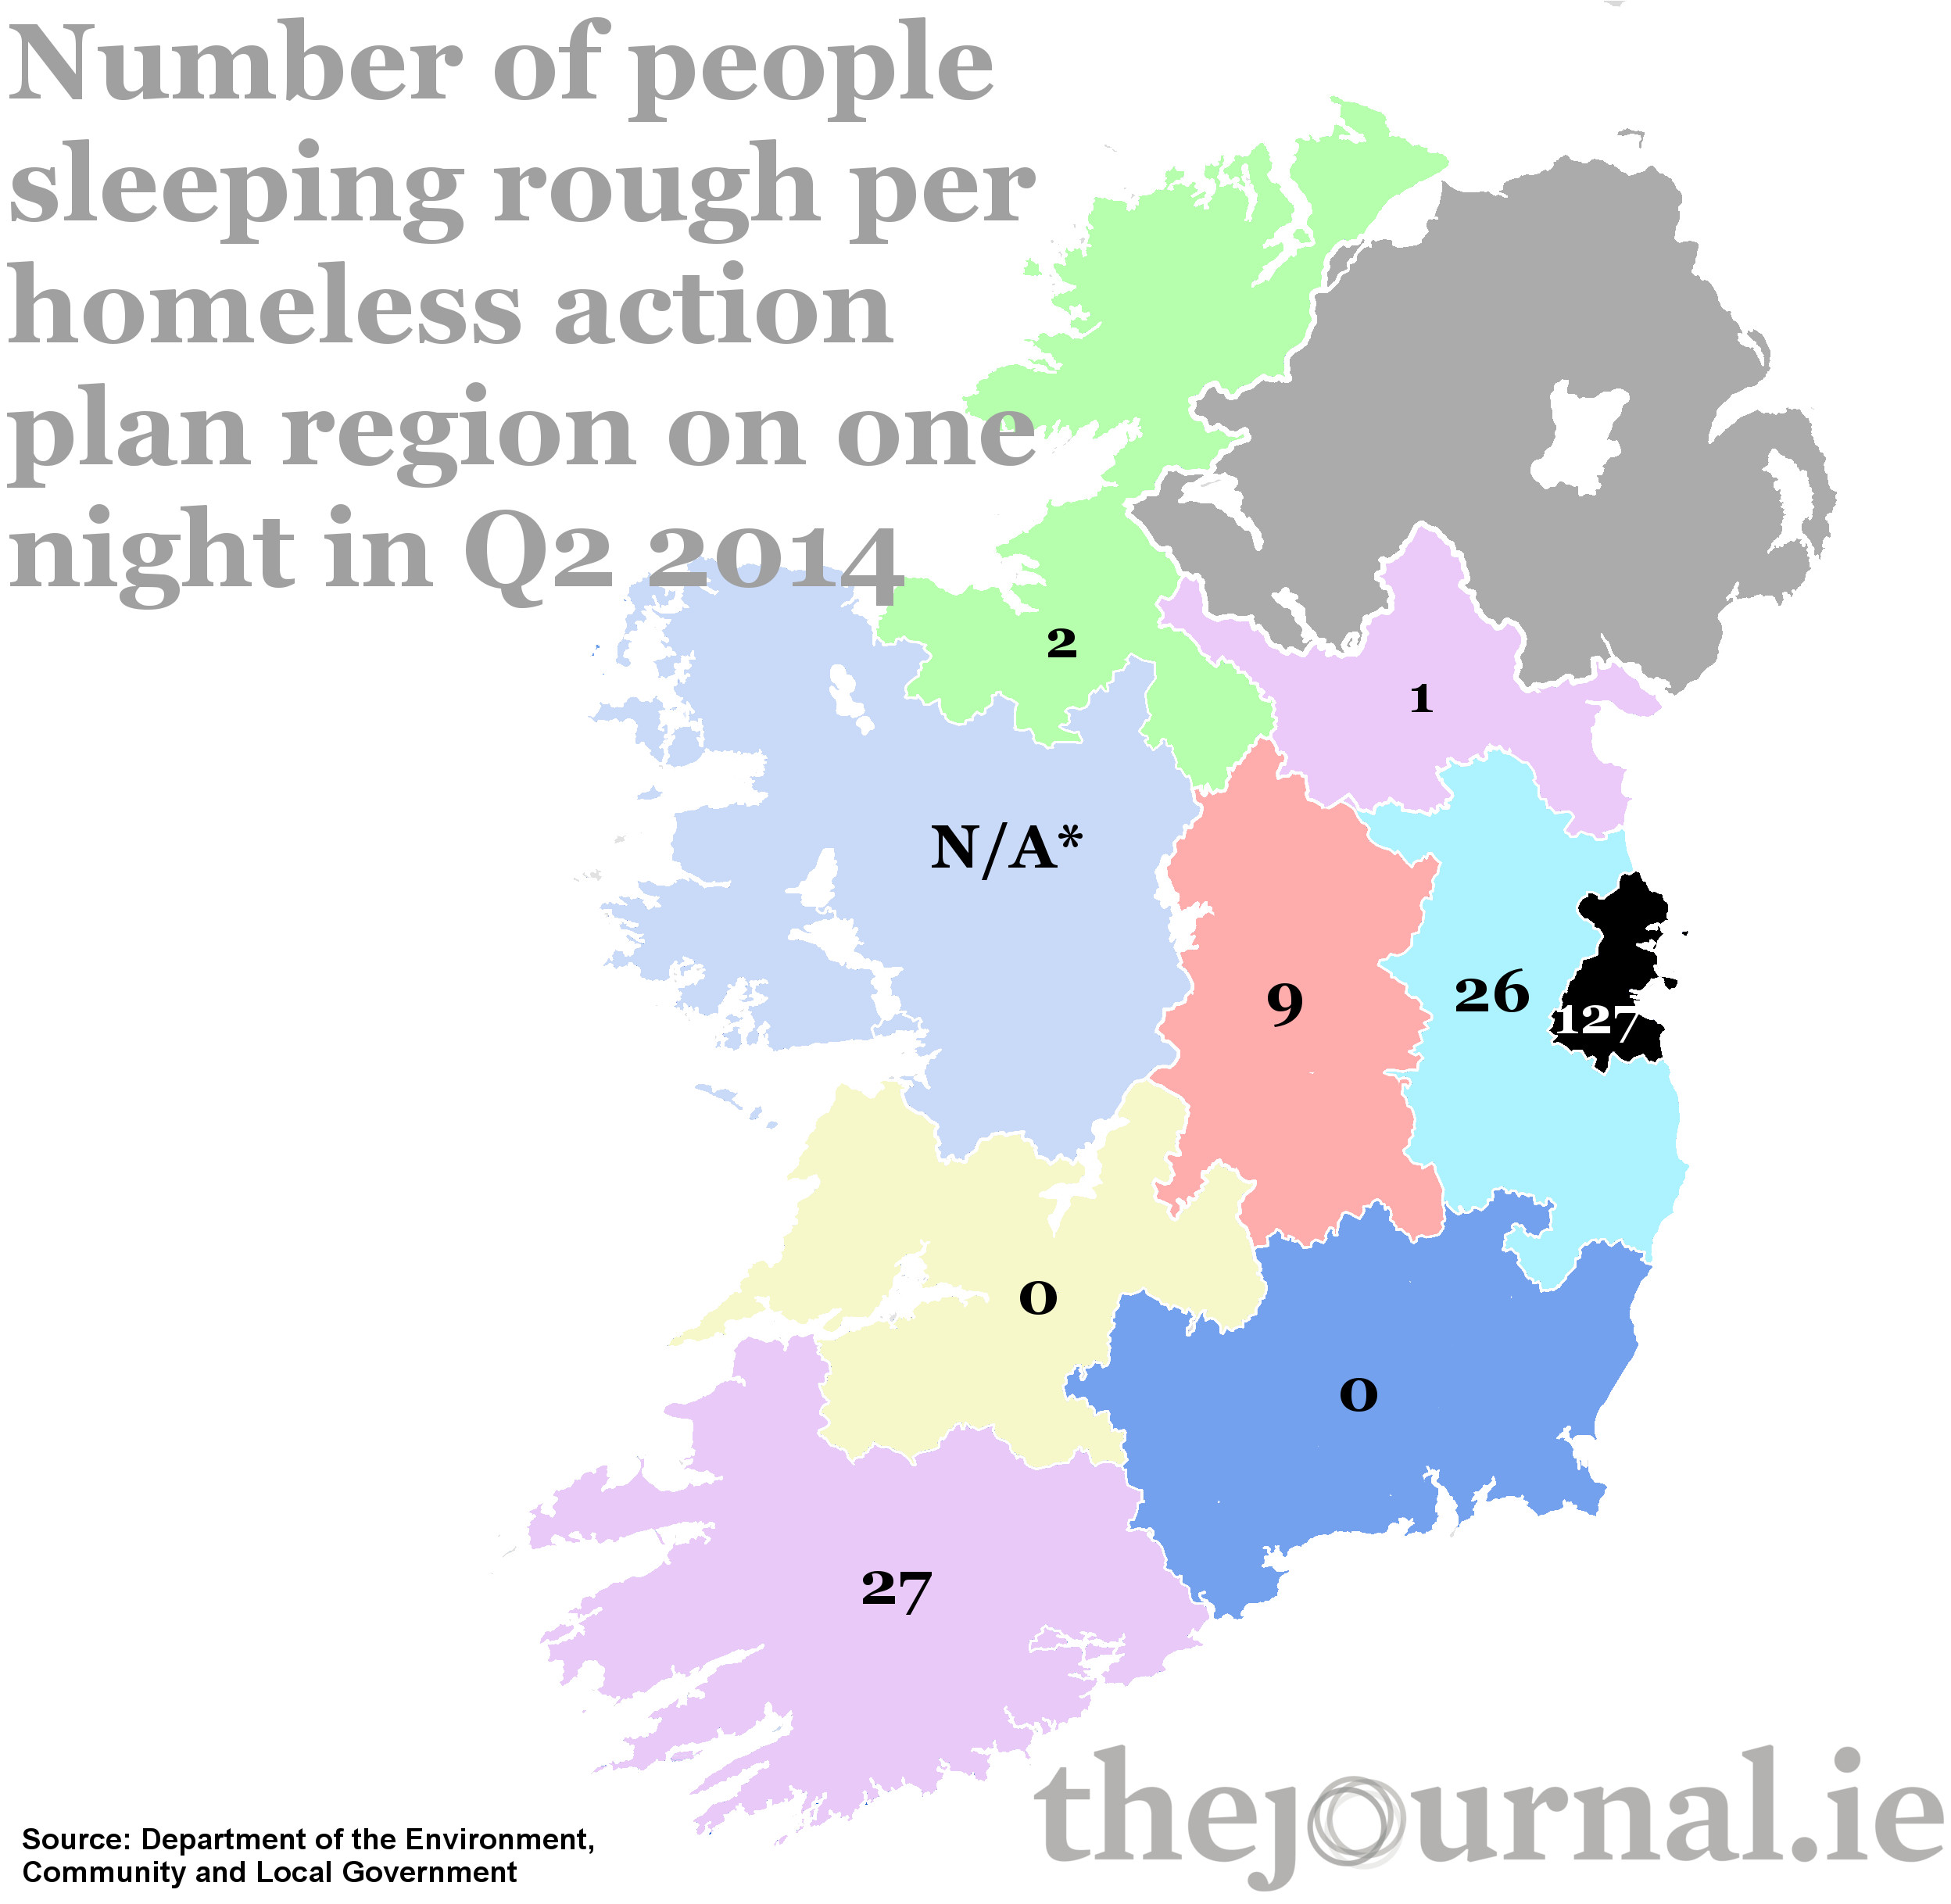 Homelessness in ireland